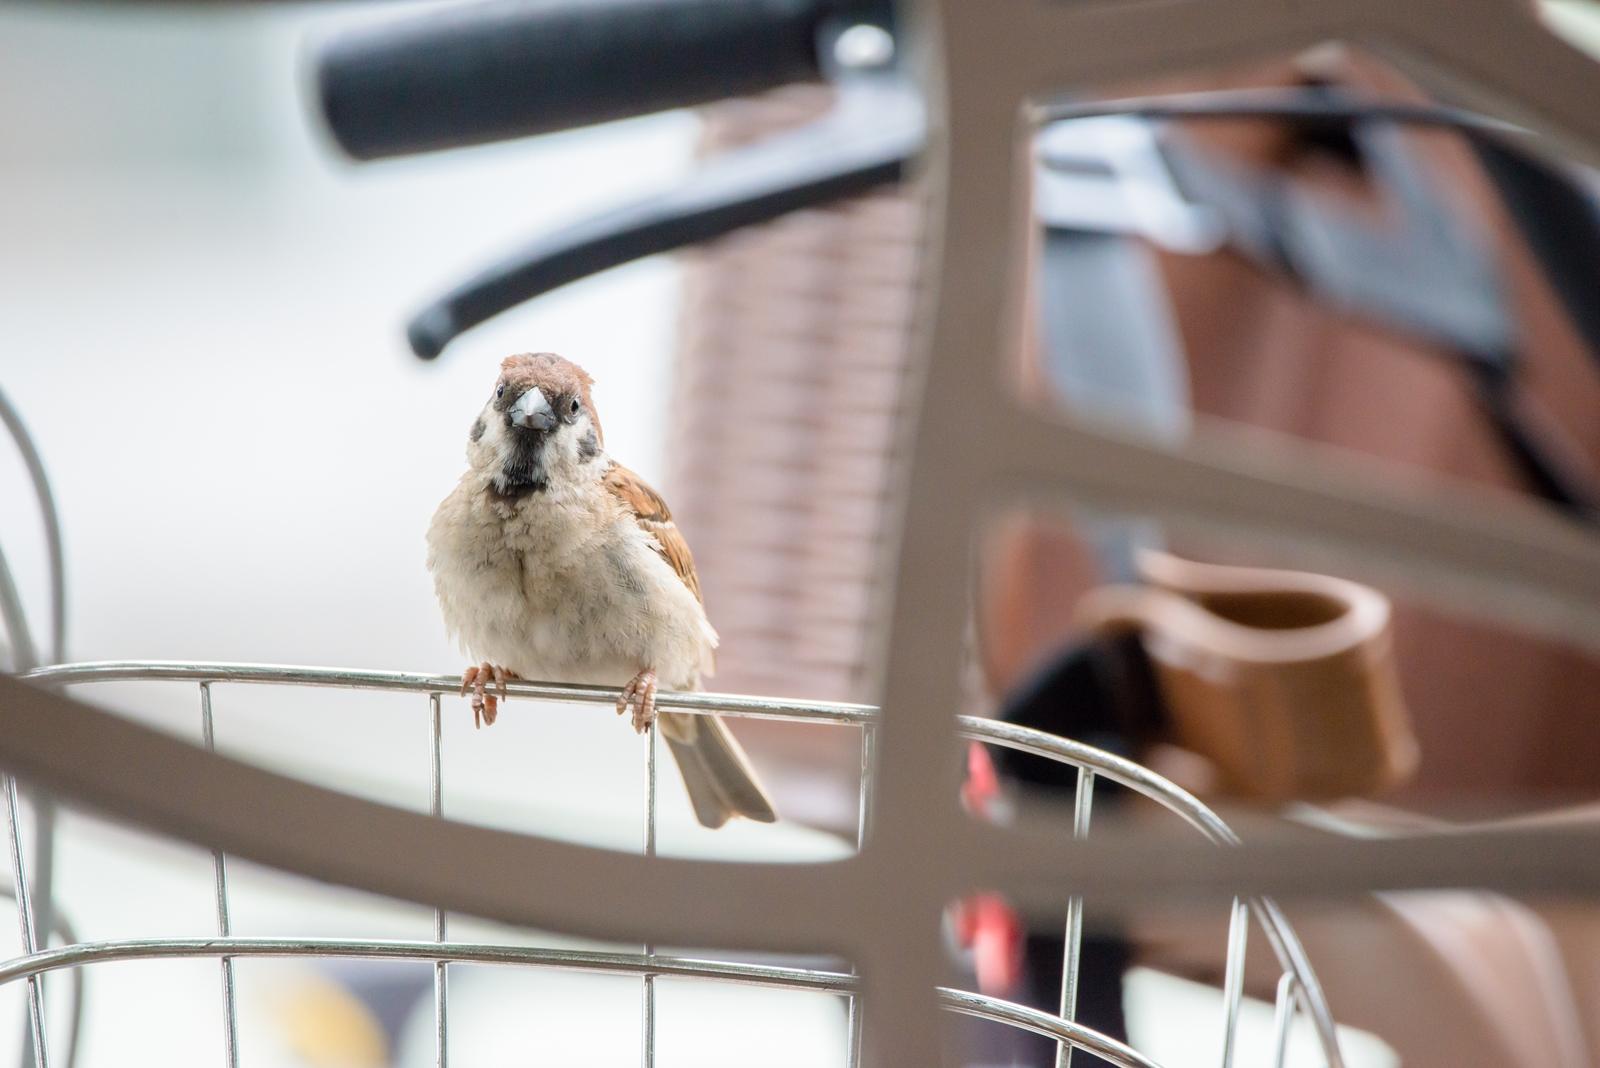 Photo: どこか連れてって Take me somewhere.  どこからか来て どこかへと行ってしまう にんげんの乗り物 ここにいたら どこか連れてってくれるのかな  Sparrow. (雀)  #birdphotography #birds #cooljapan #kawaii #nikon #sigma  Nikon D800E SIGMA 150-600mm F5-6.3 DG OS HSM Contemporary